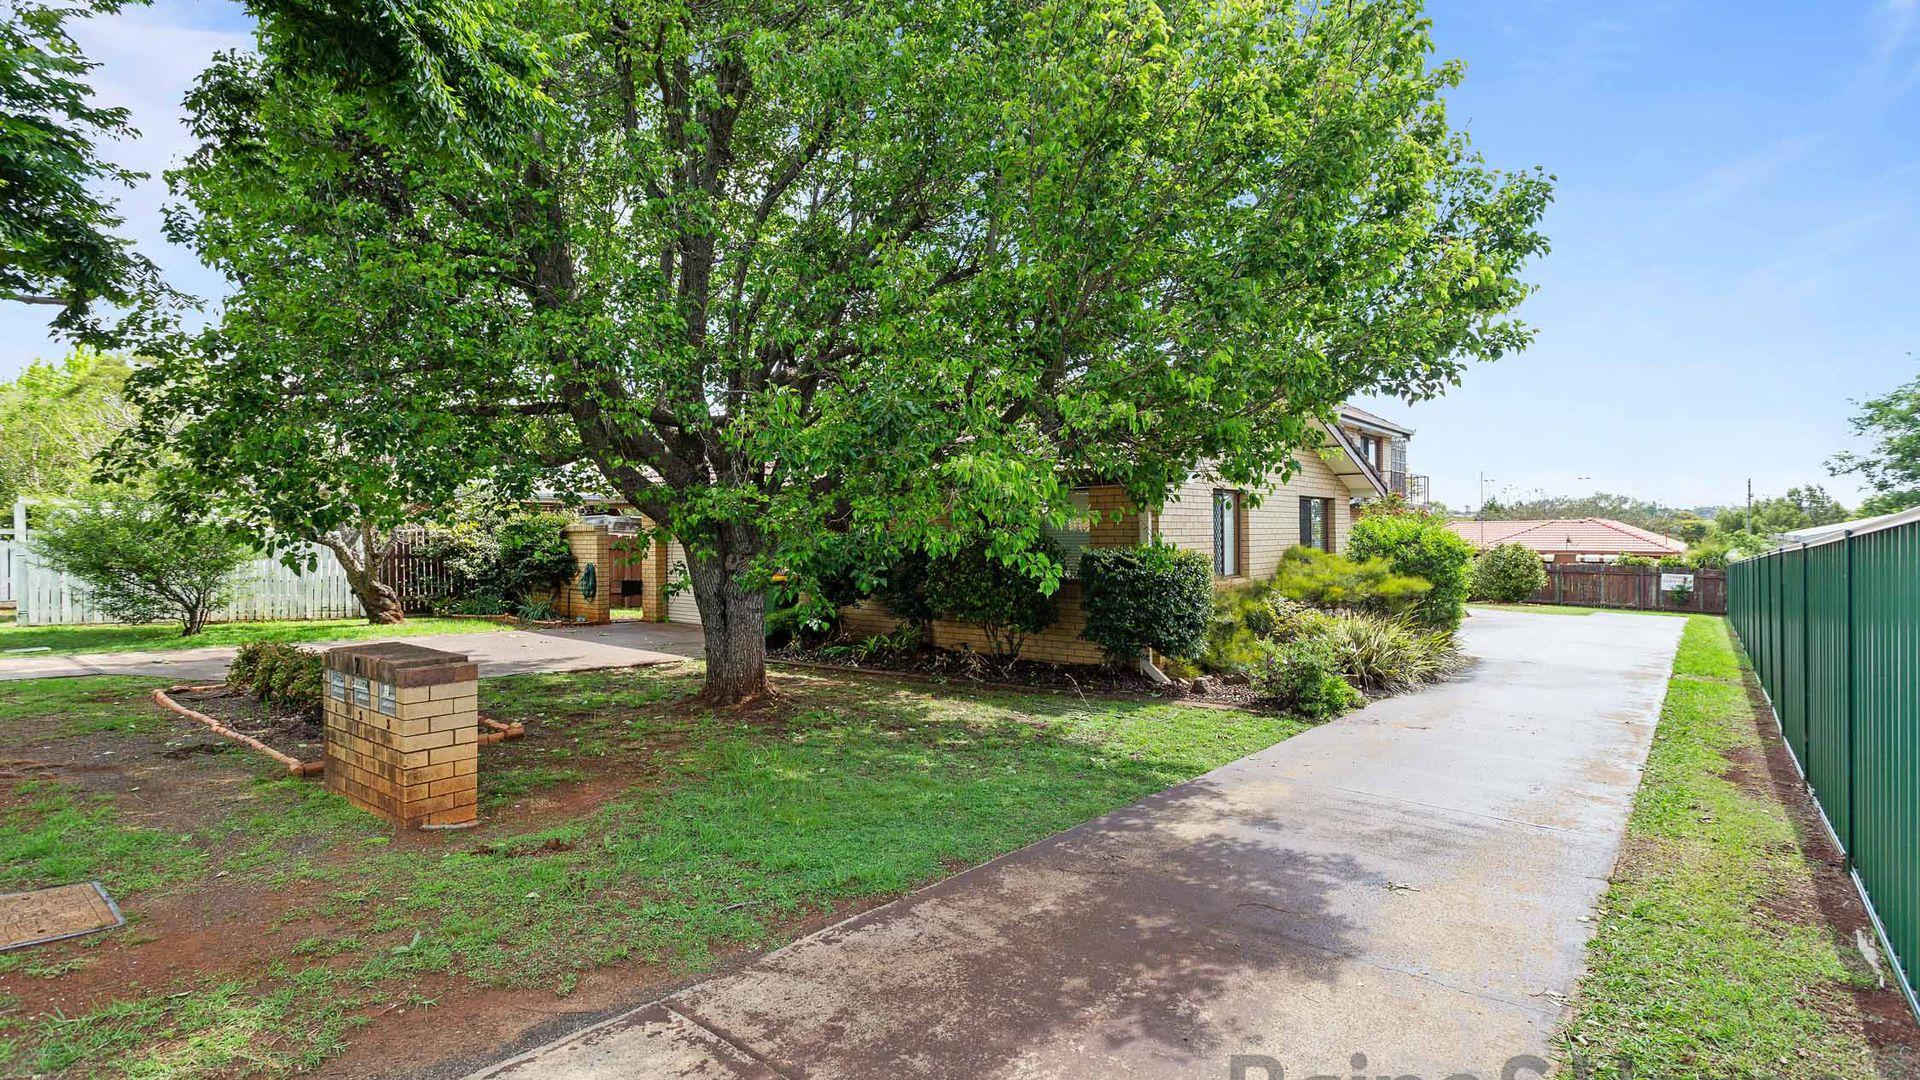 3/7 Damian Crescent, Kearneys Spring QLD 4350, Image 1